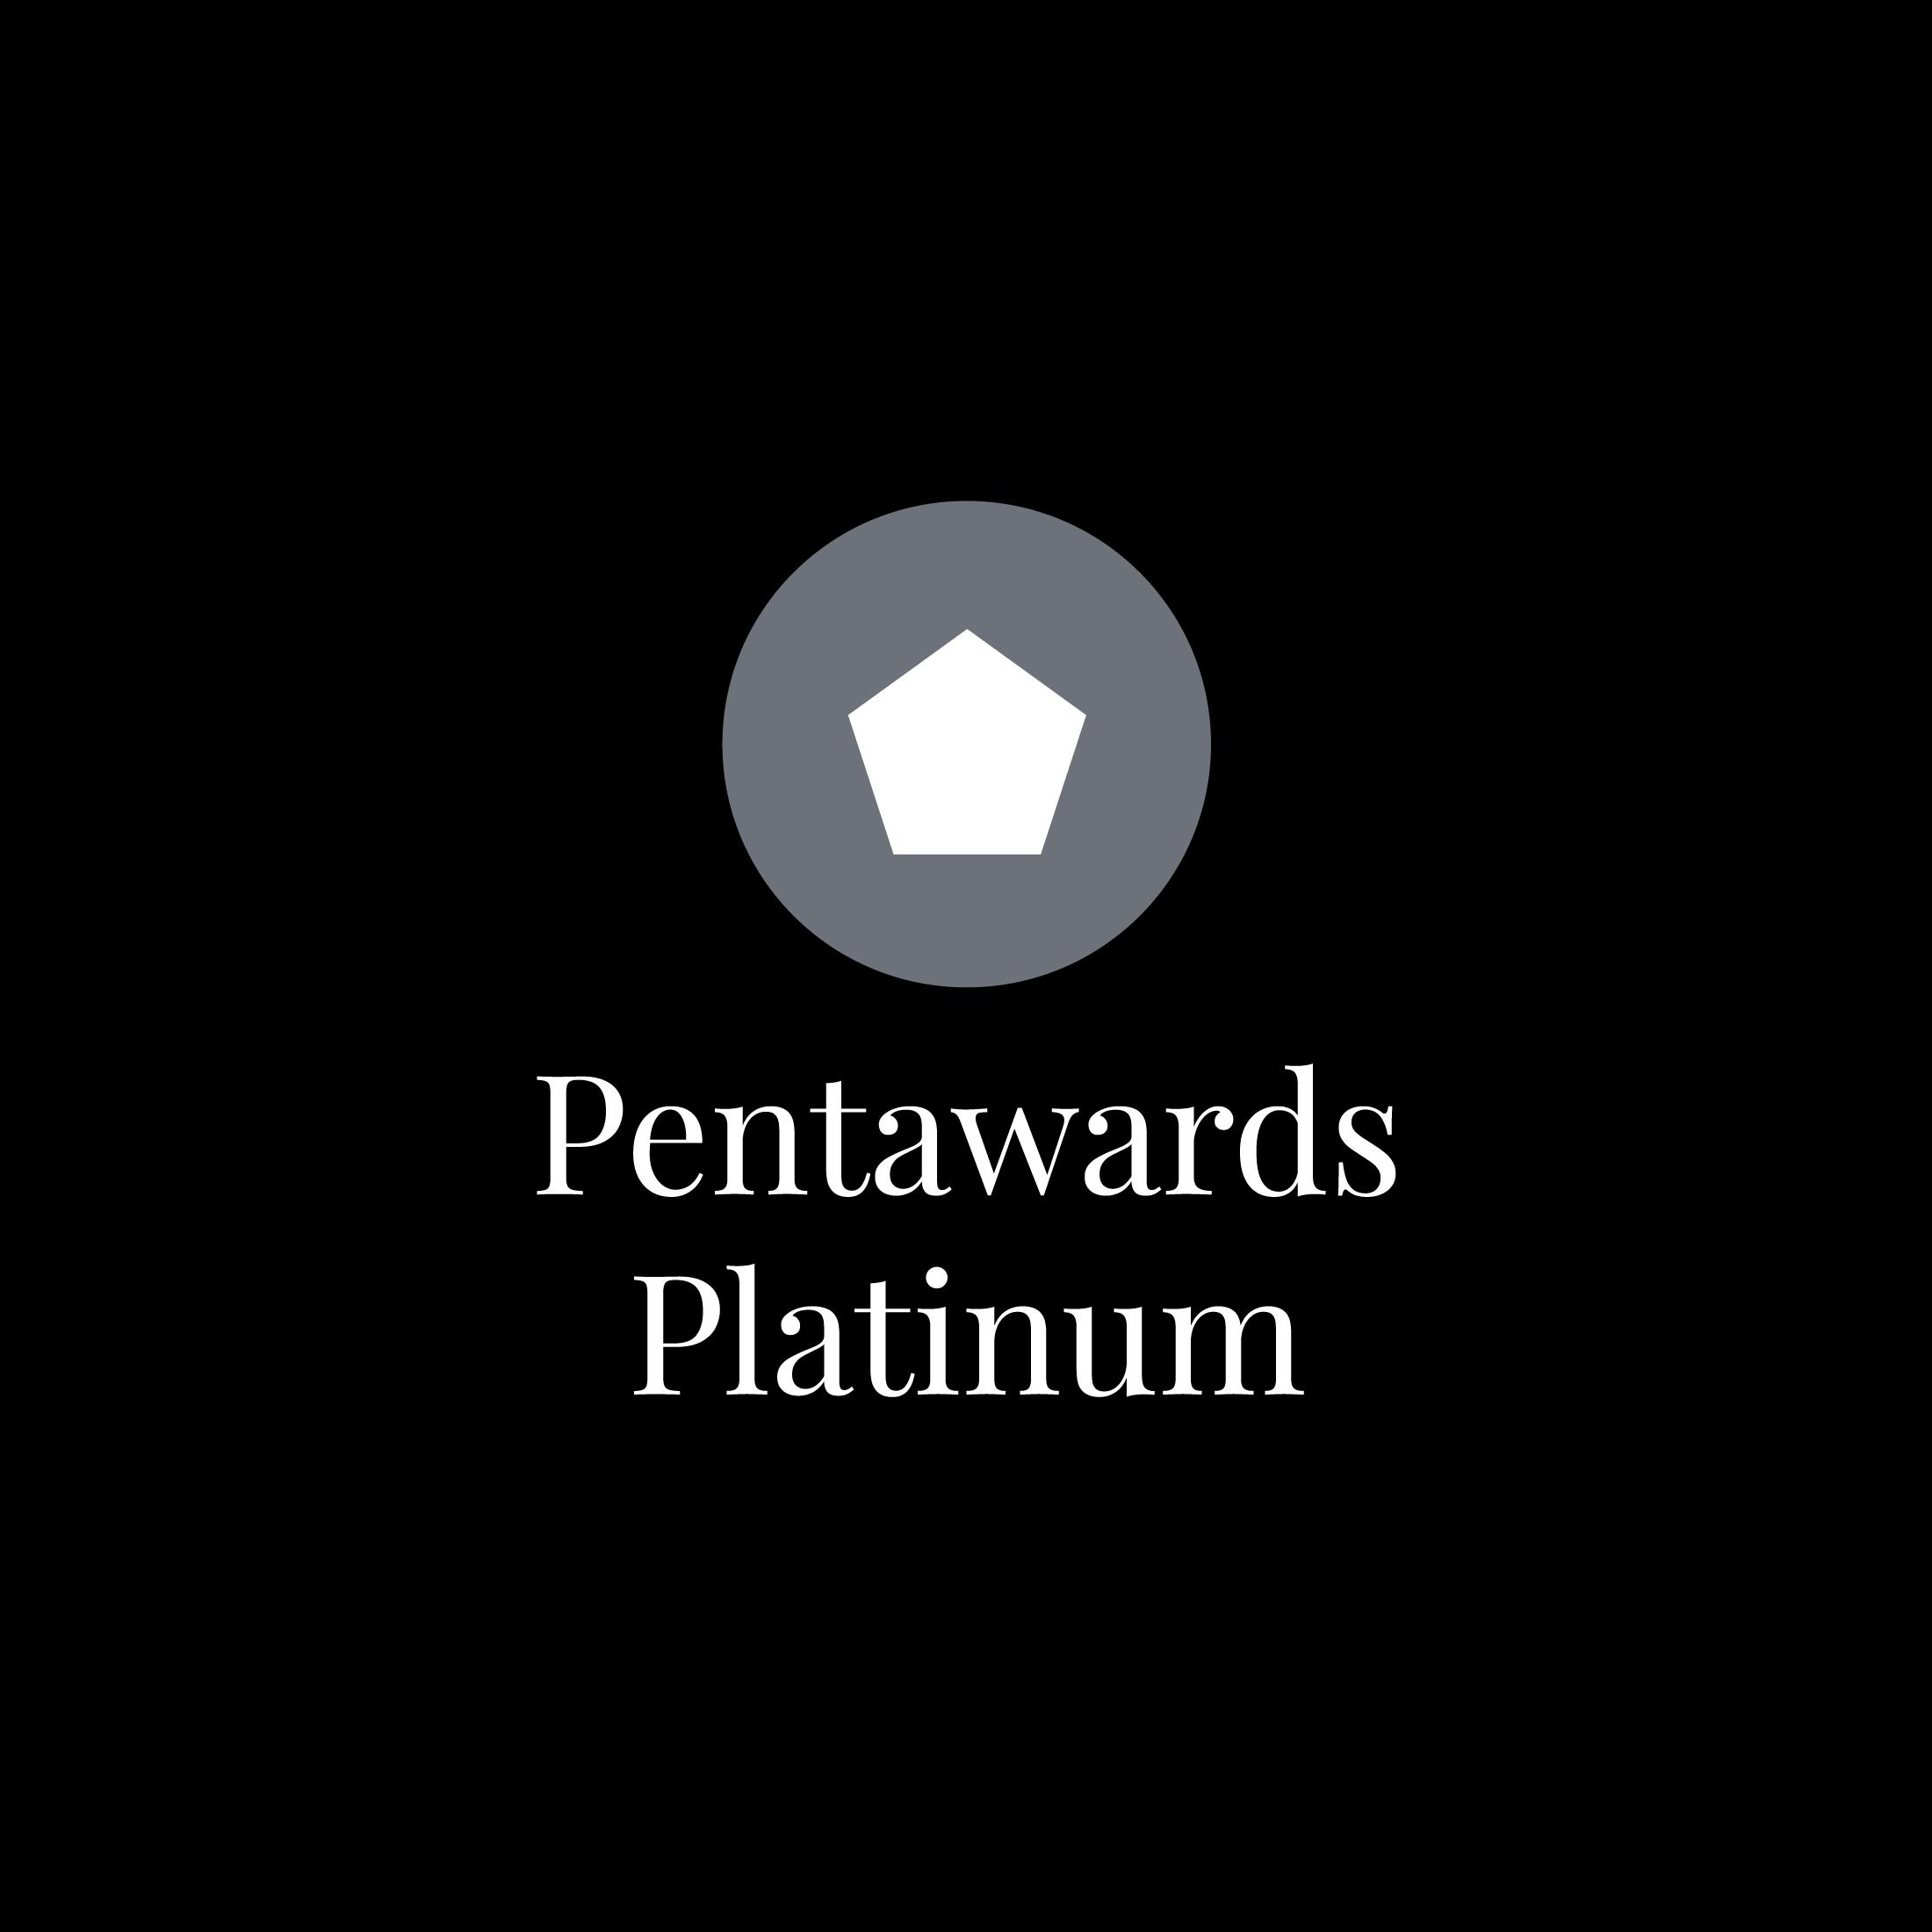 new-packaging-best-luxury-beverages-pentawards-platinum-2019-roberto-nunez-